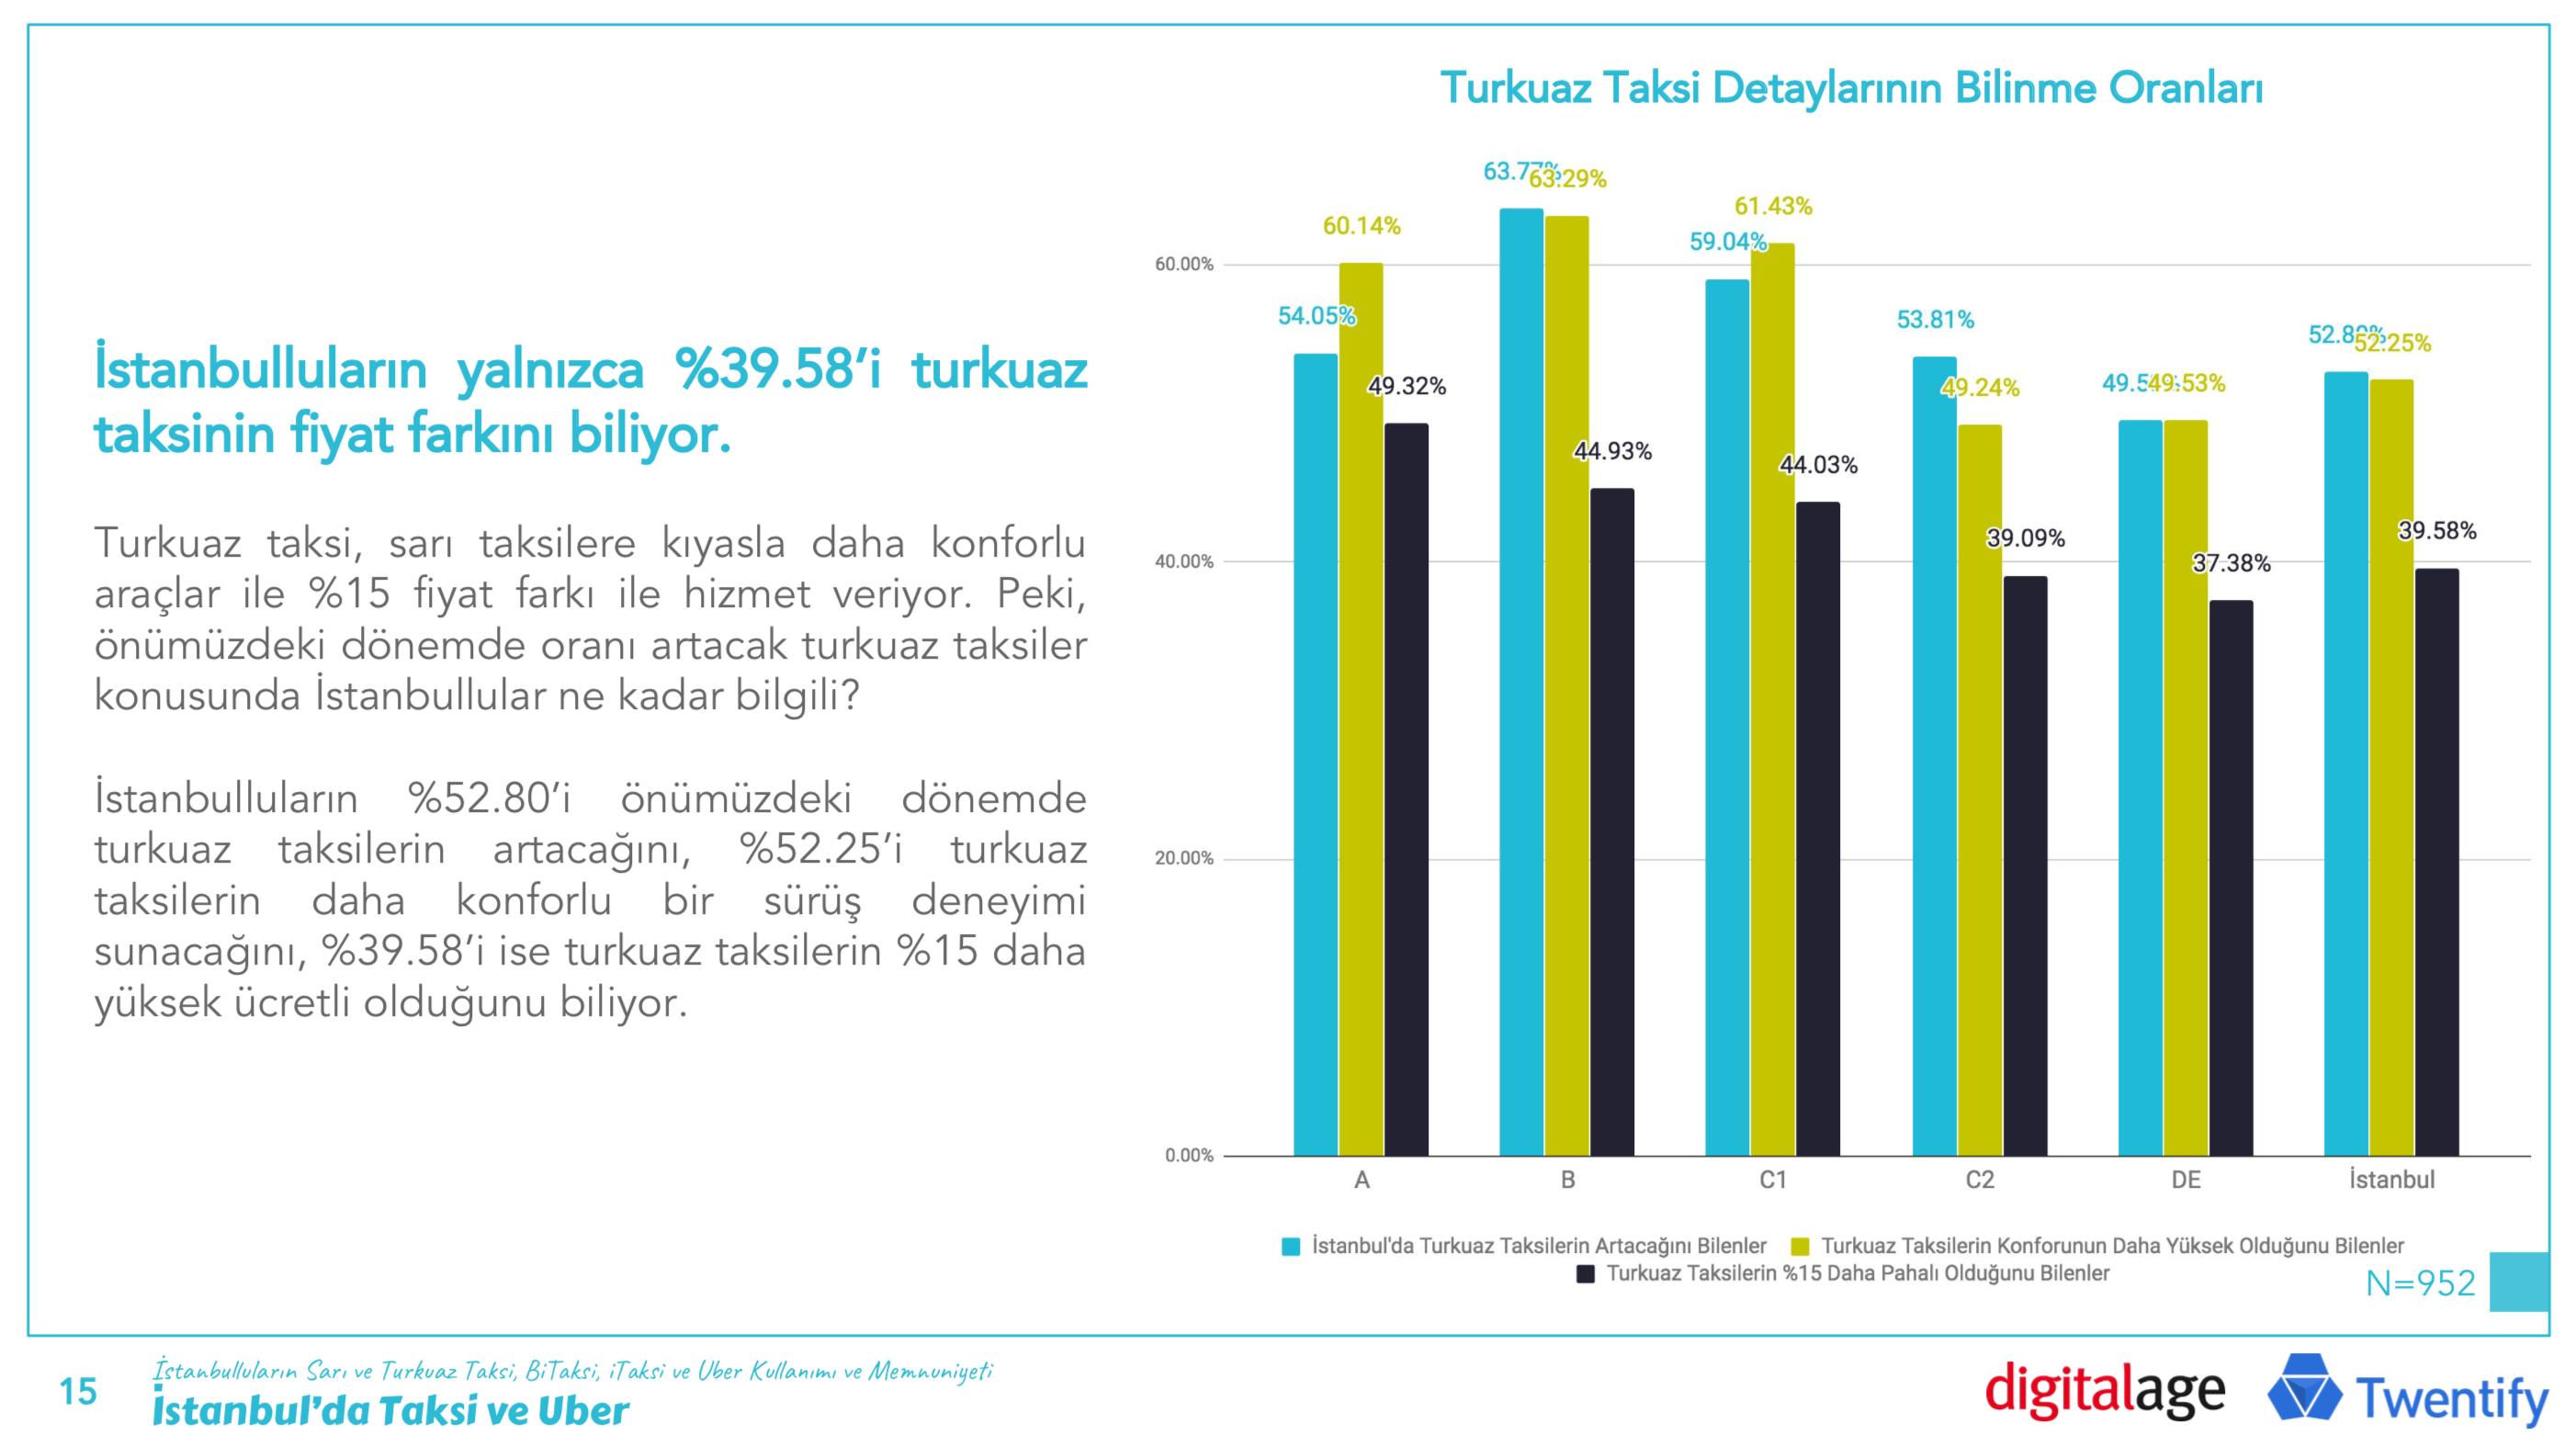 turkuaz_bilinme_orani.png